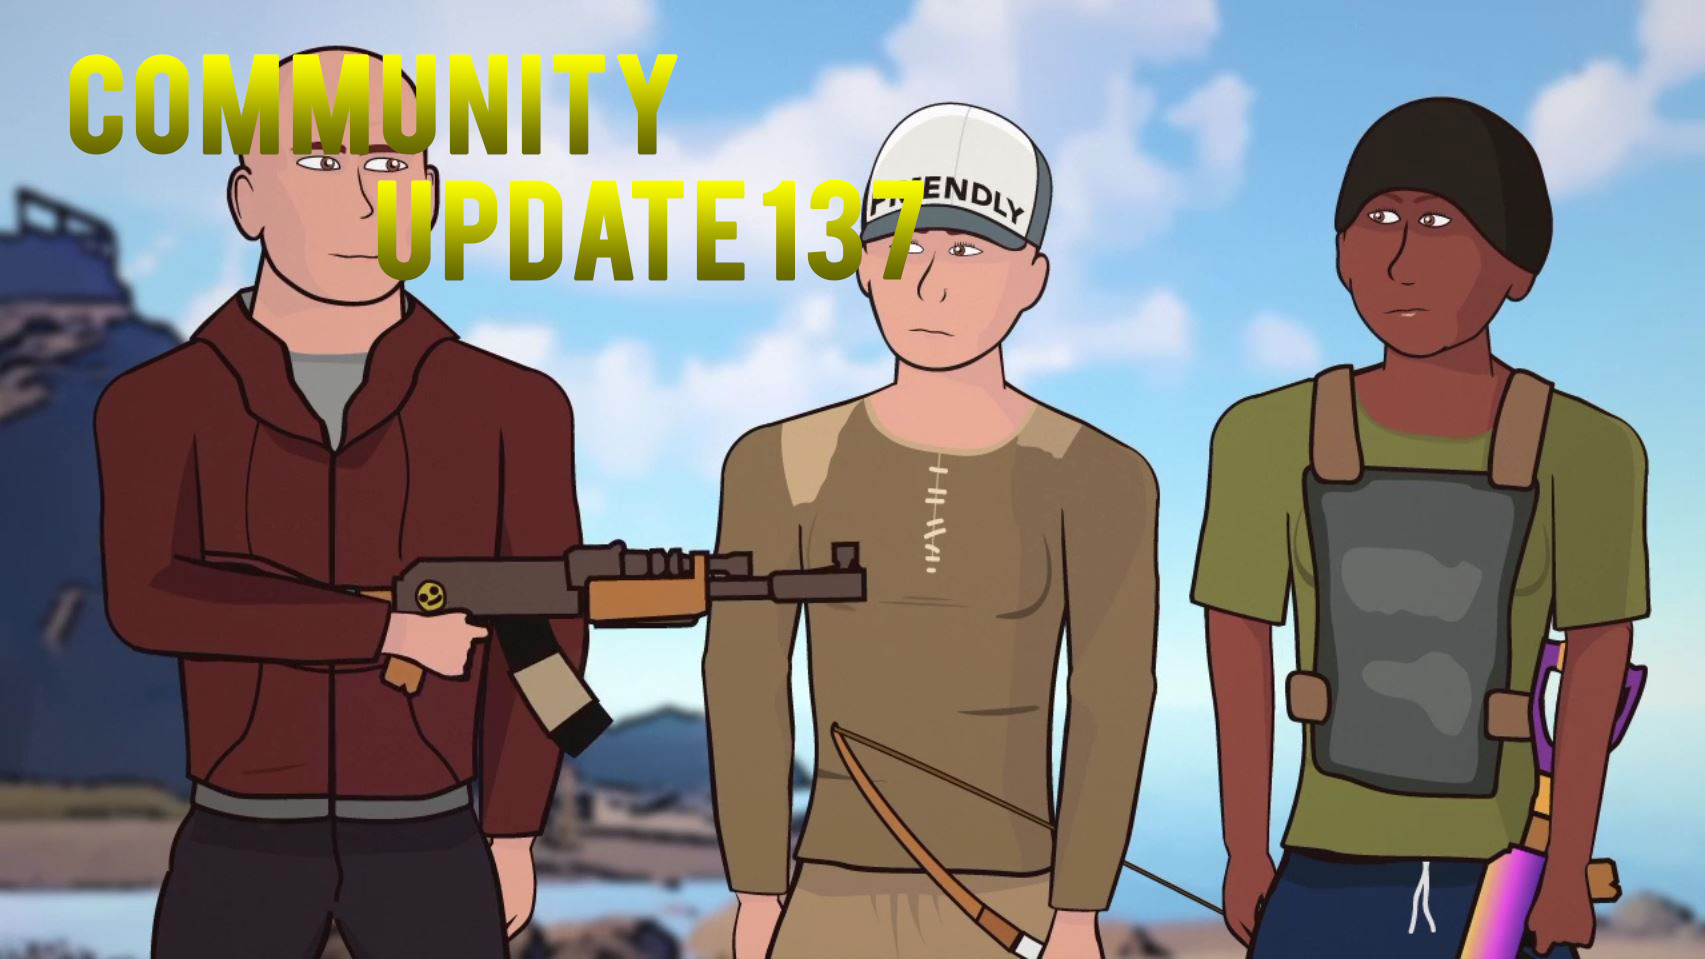 Community Update 137